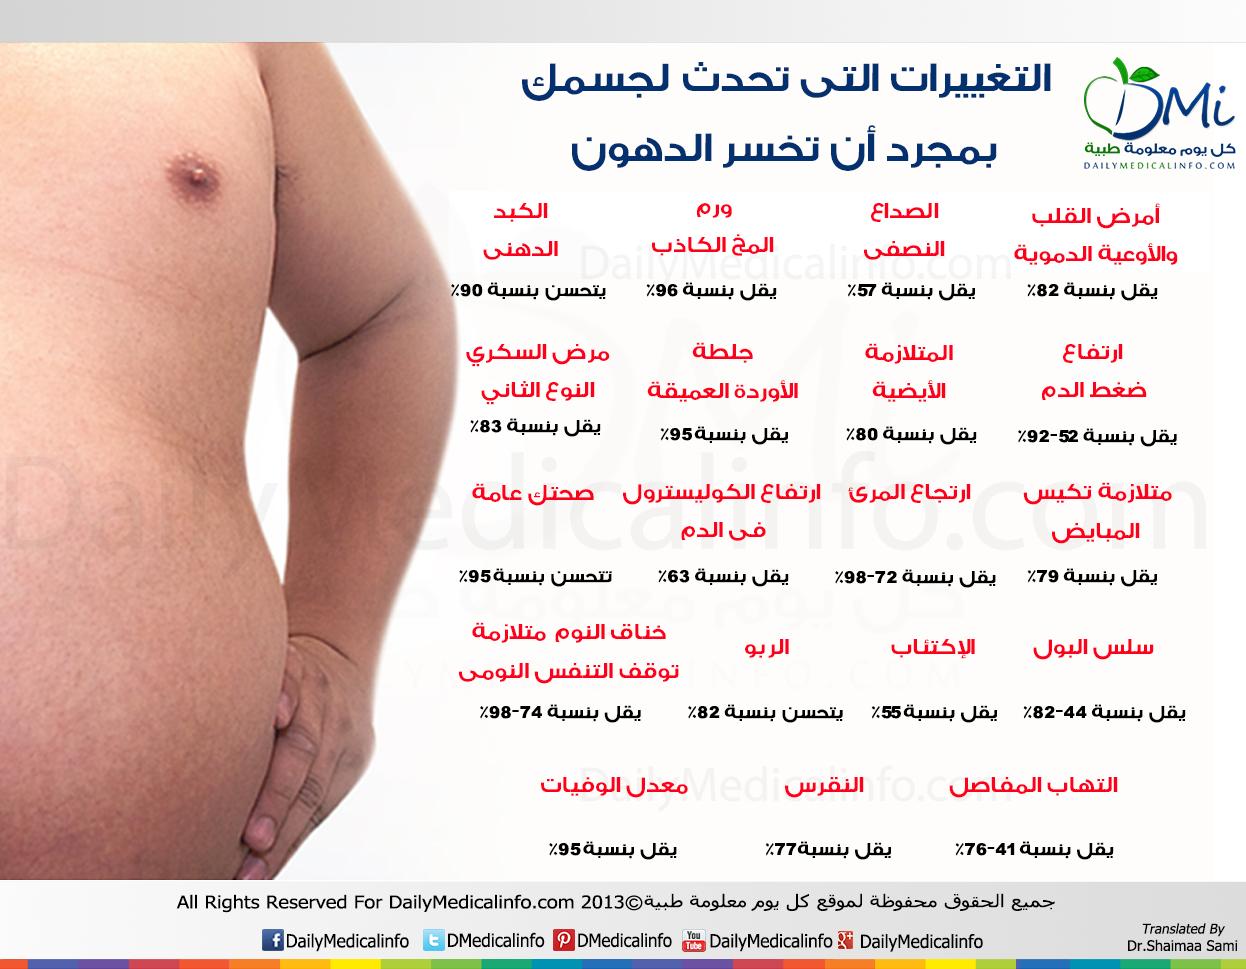 DailyMedicalinfo When you lose Fat